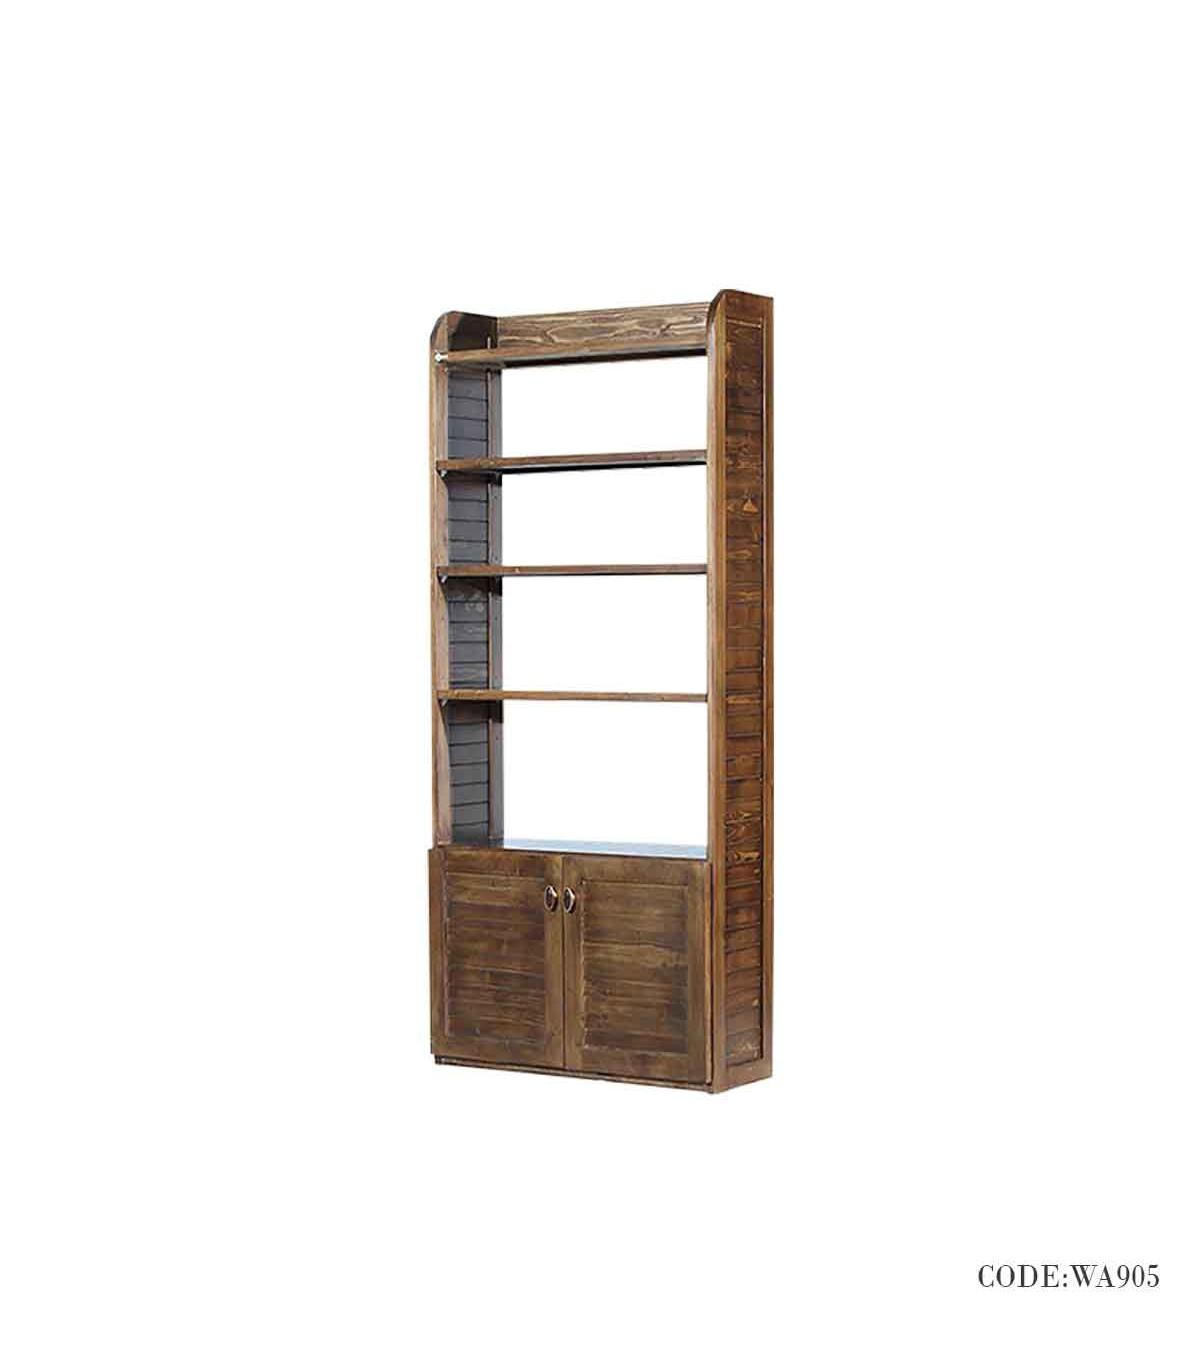 کتابخانه تمام چوب مدل رانا